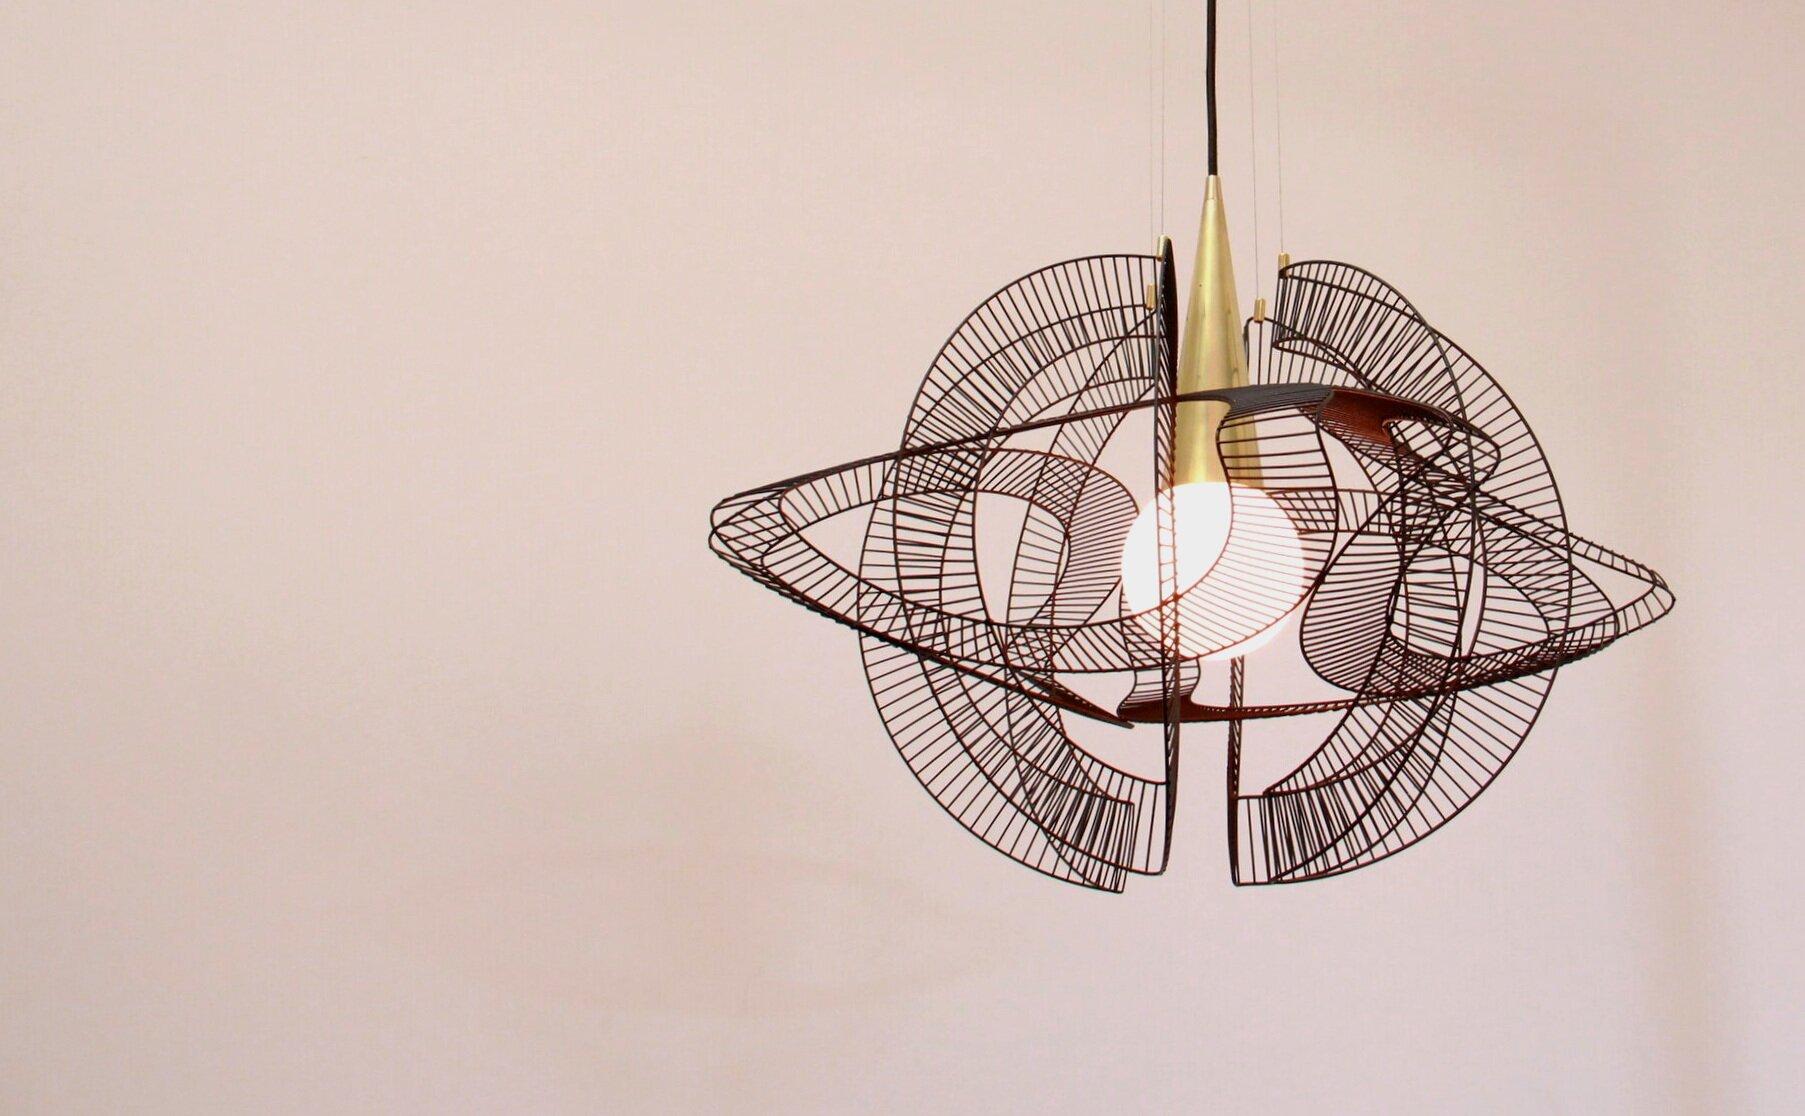 Olas_Sphera_black_brass_luminaire_design_lampe_lamp_studio-botte_pendant 4.JPG